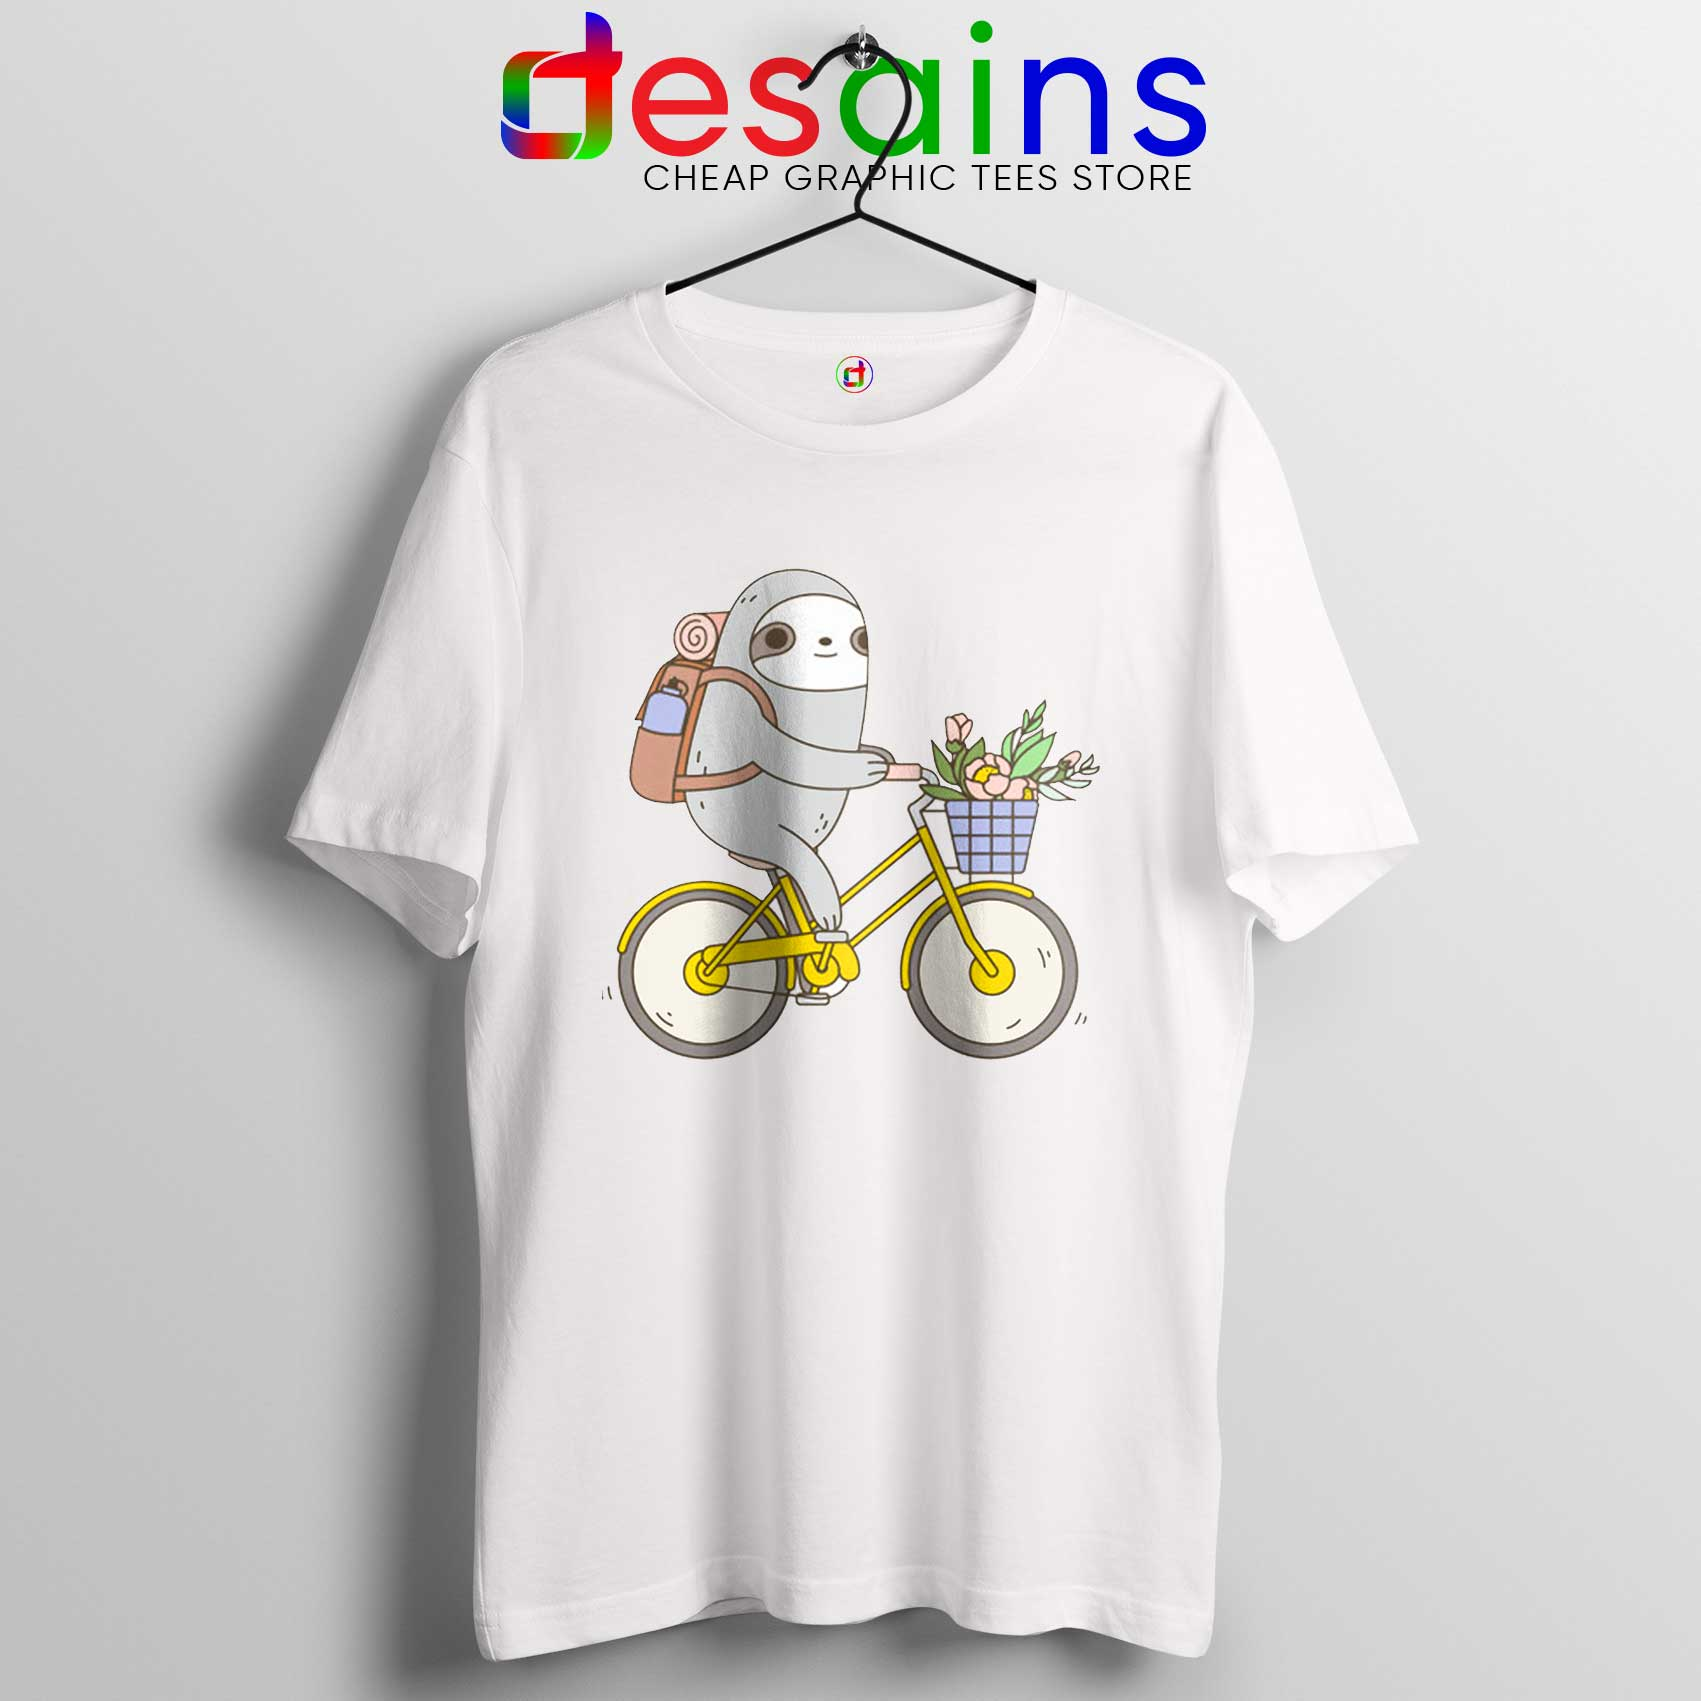 a080d81d4 Buy-Biking-Sloth-Tee-Shirts-Real-Life-Sloth-Tshirt-Size-S-3XL.jpg